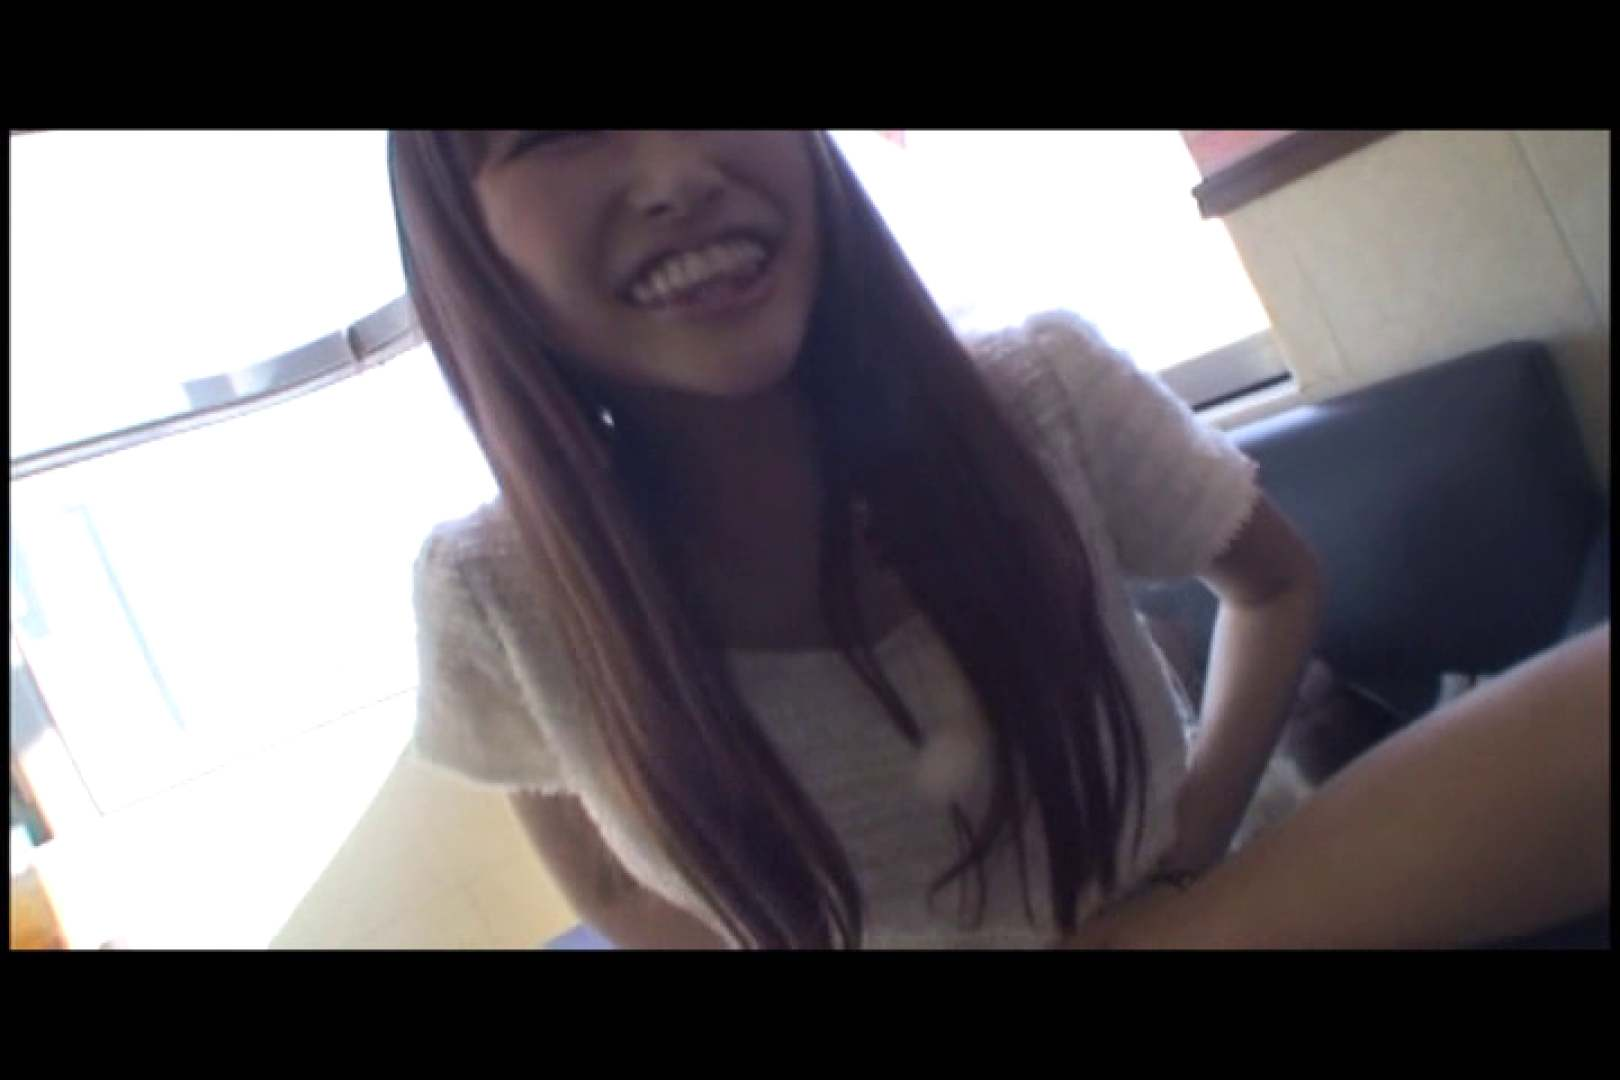 JDハンター全国ツアー vol.058 前編 女子大生のエロ動画  77PIX 26